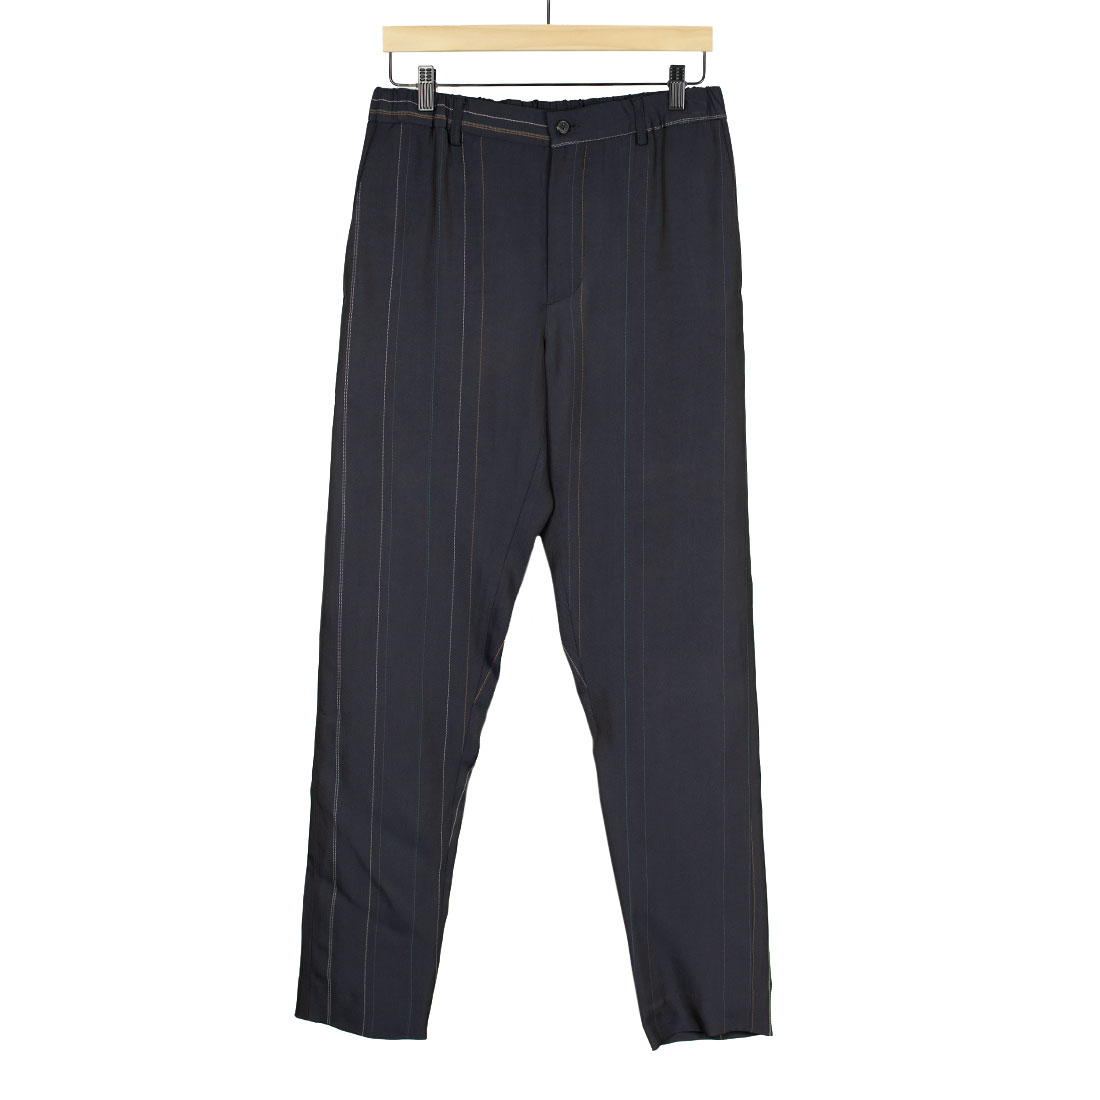 Stephan Schneider Spring Summer 2021 SS21 striped viscose easy pants (10).jpg